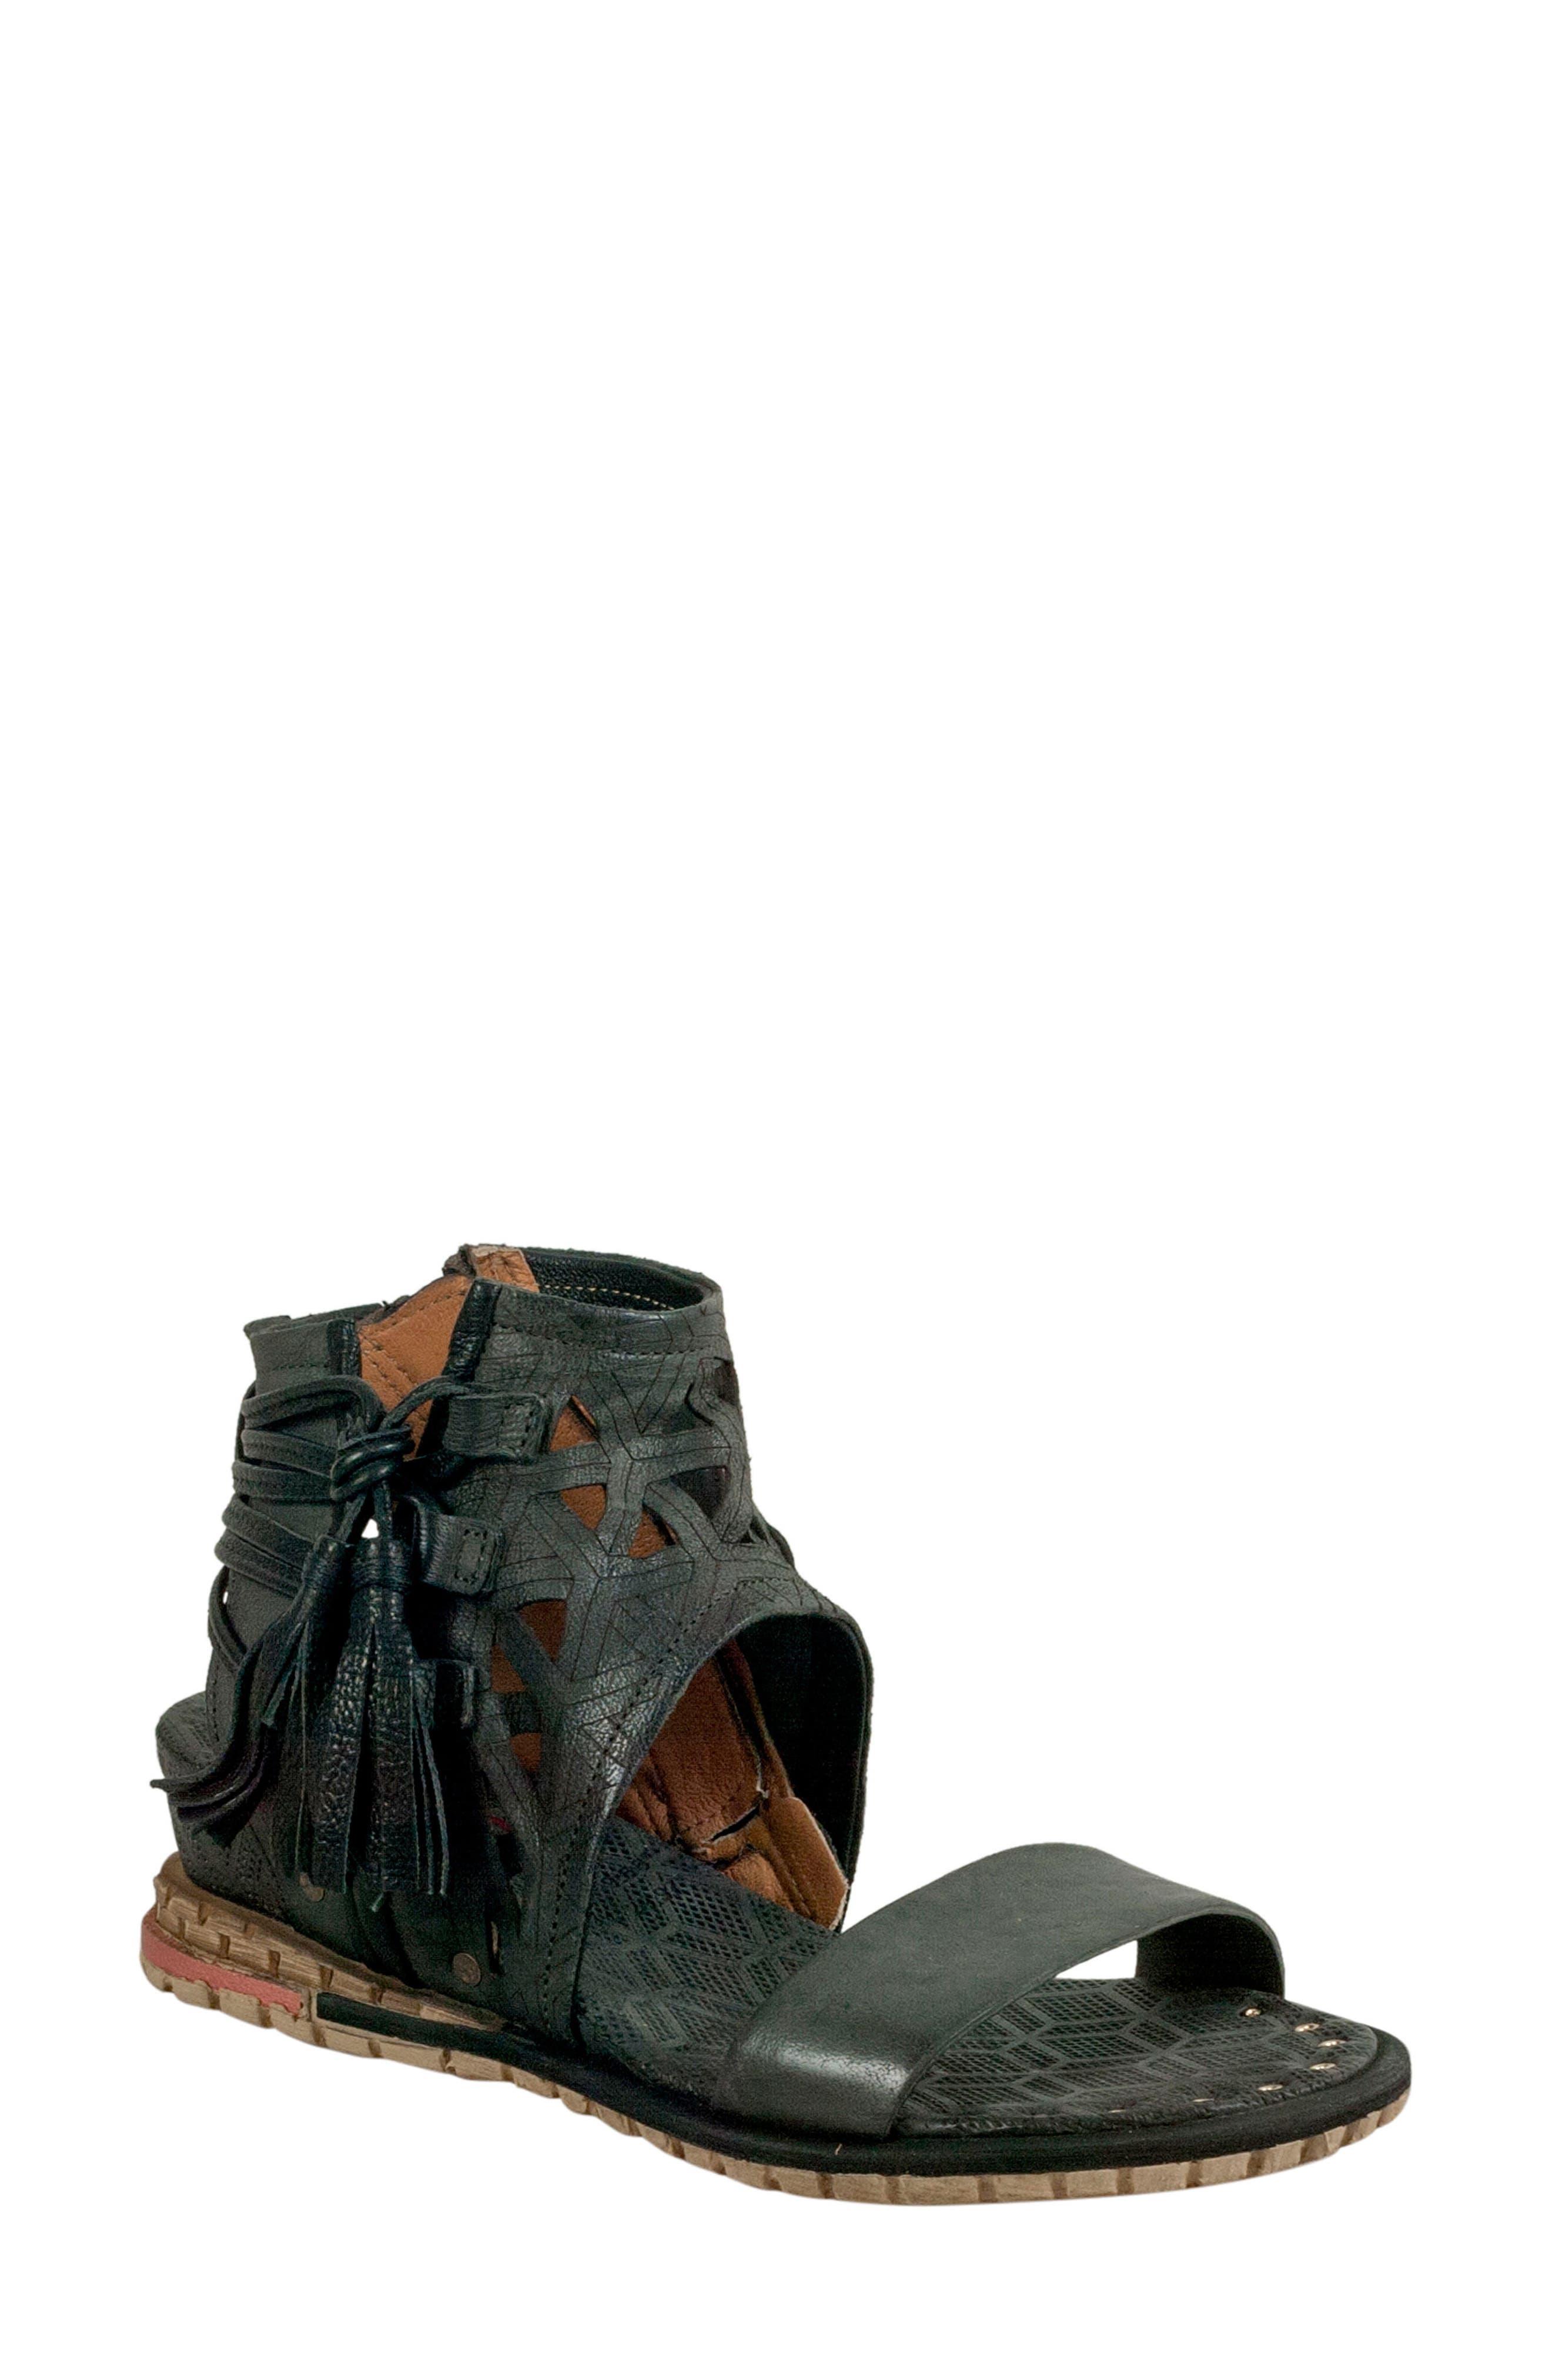 Petrona Ankle Shield Sandal,                         Main,                         color, 095